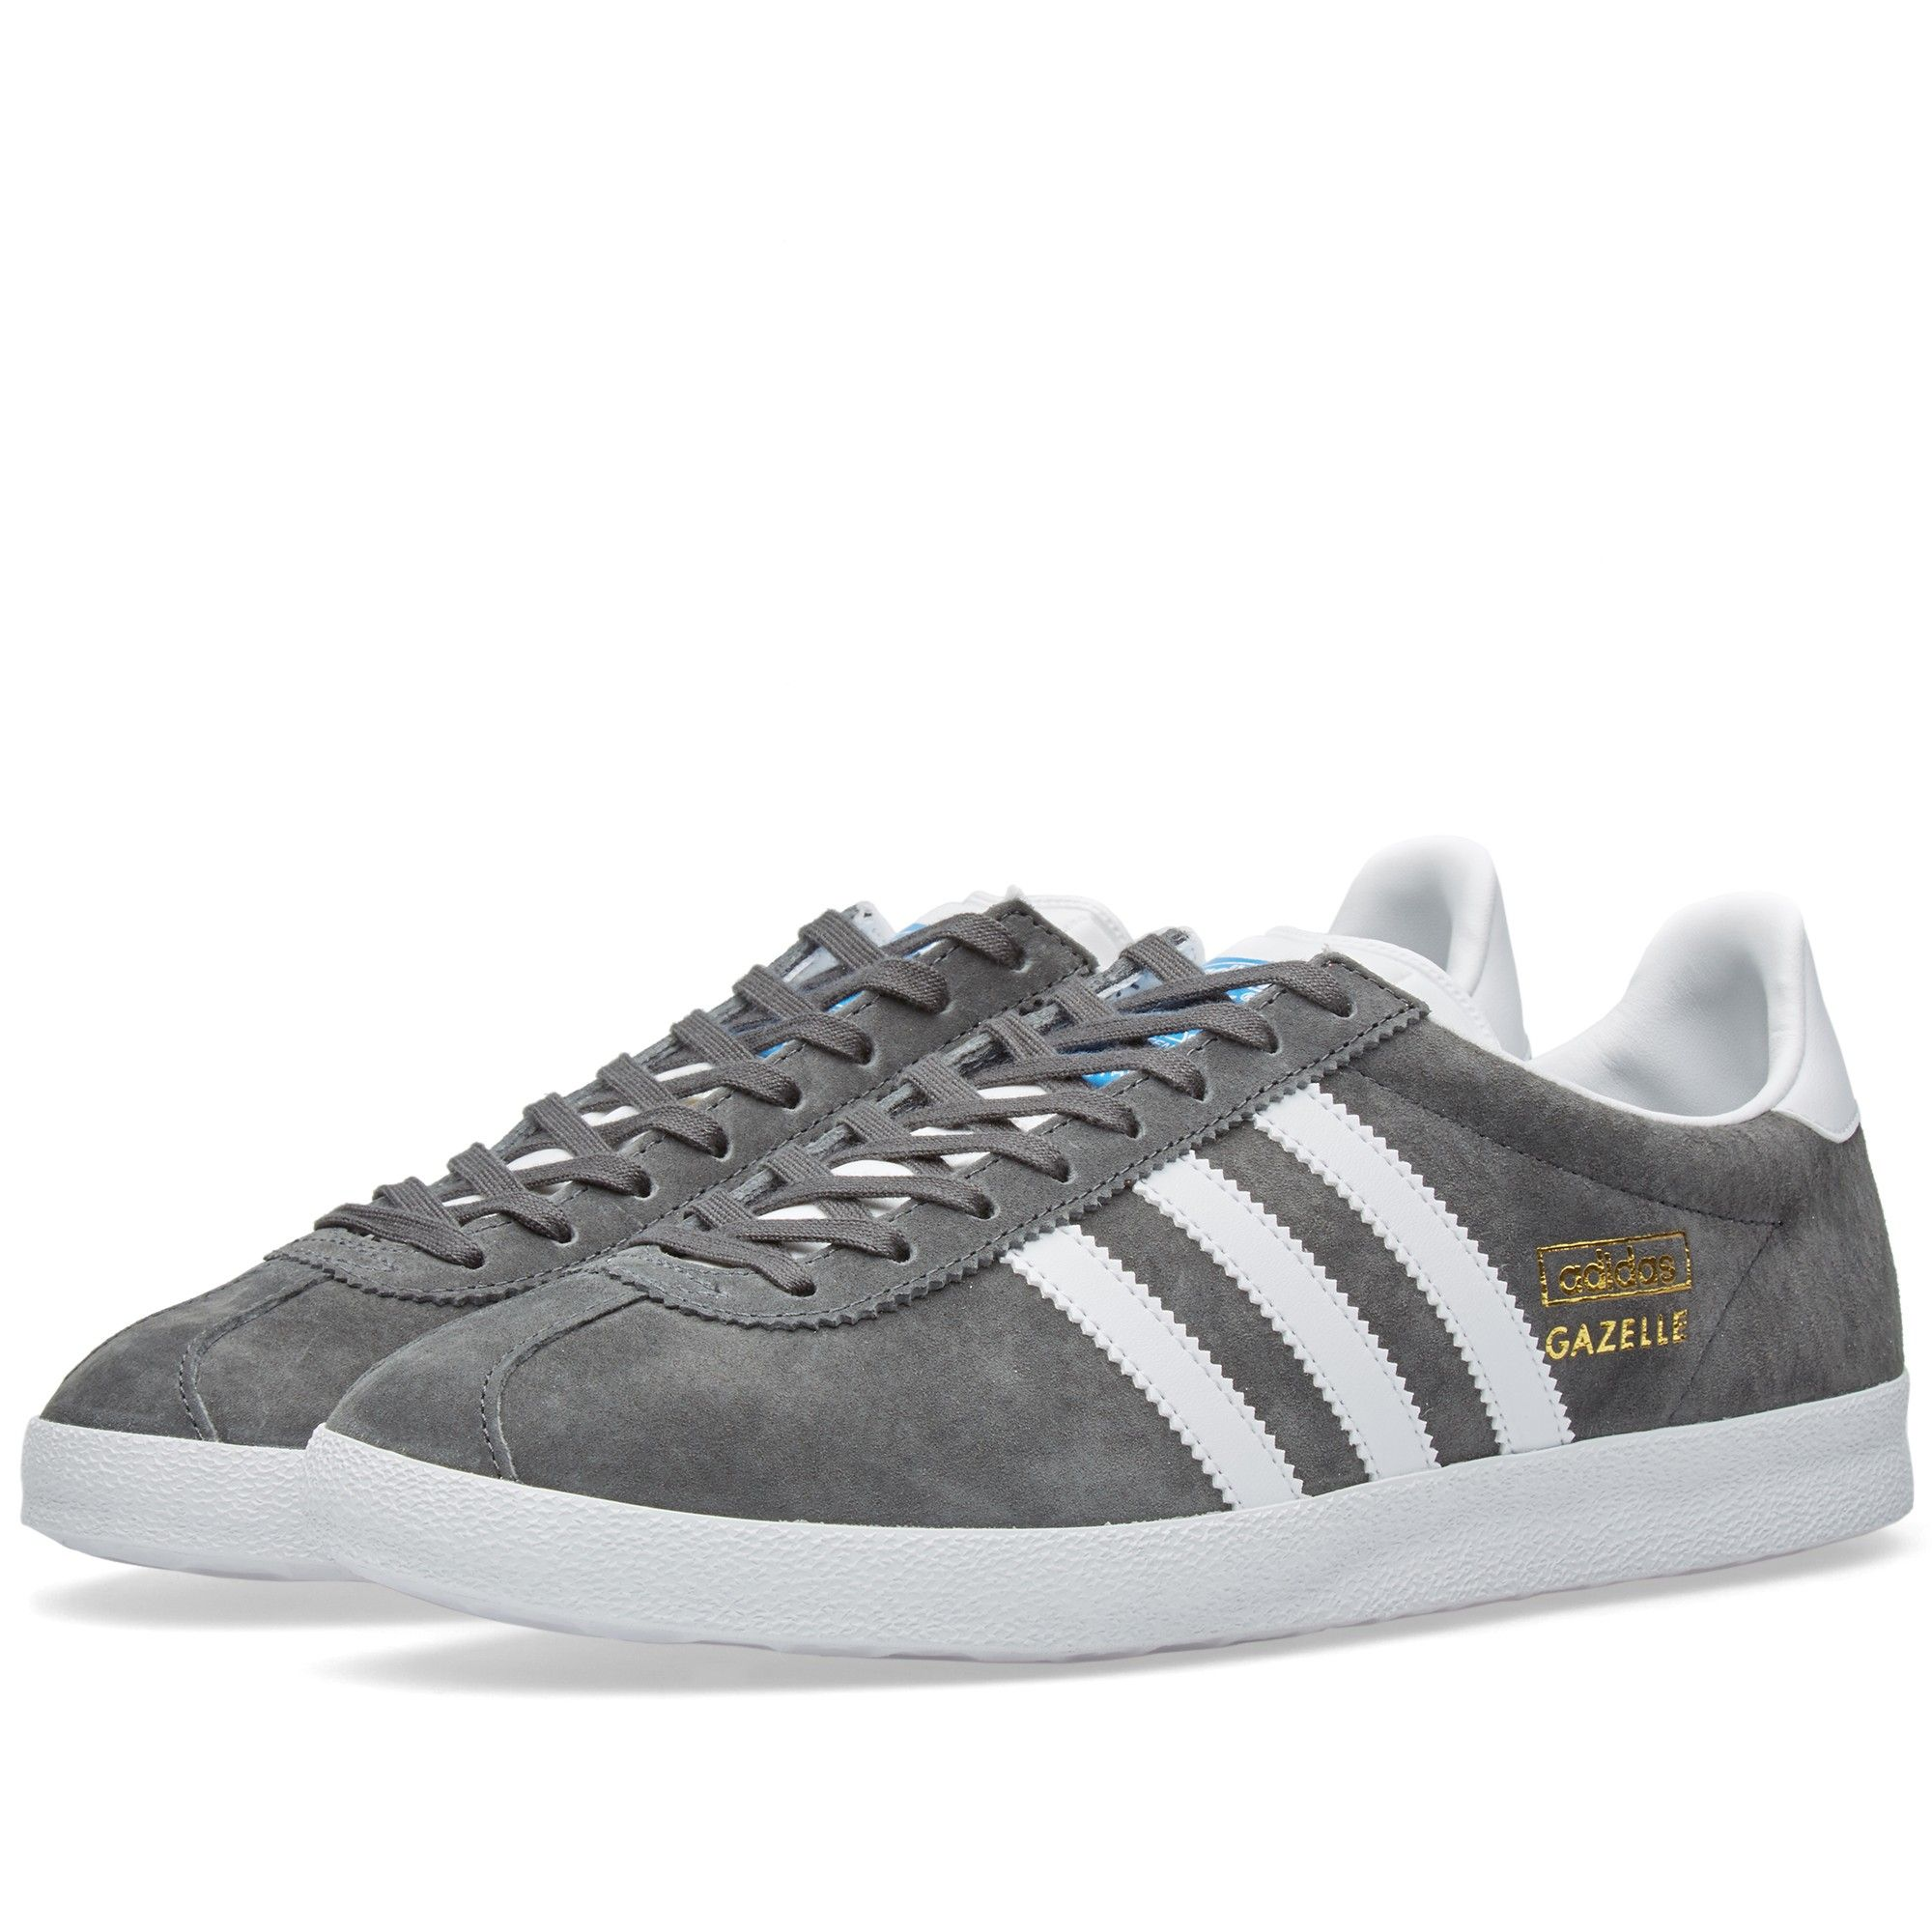 Adidas Gazelle OG | Adidas gazelle, Adidas, Sneakers